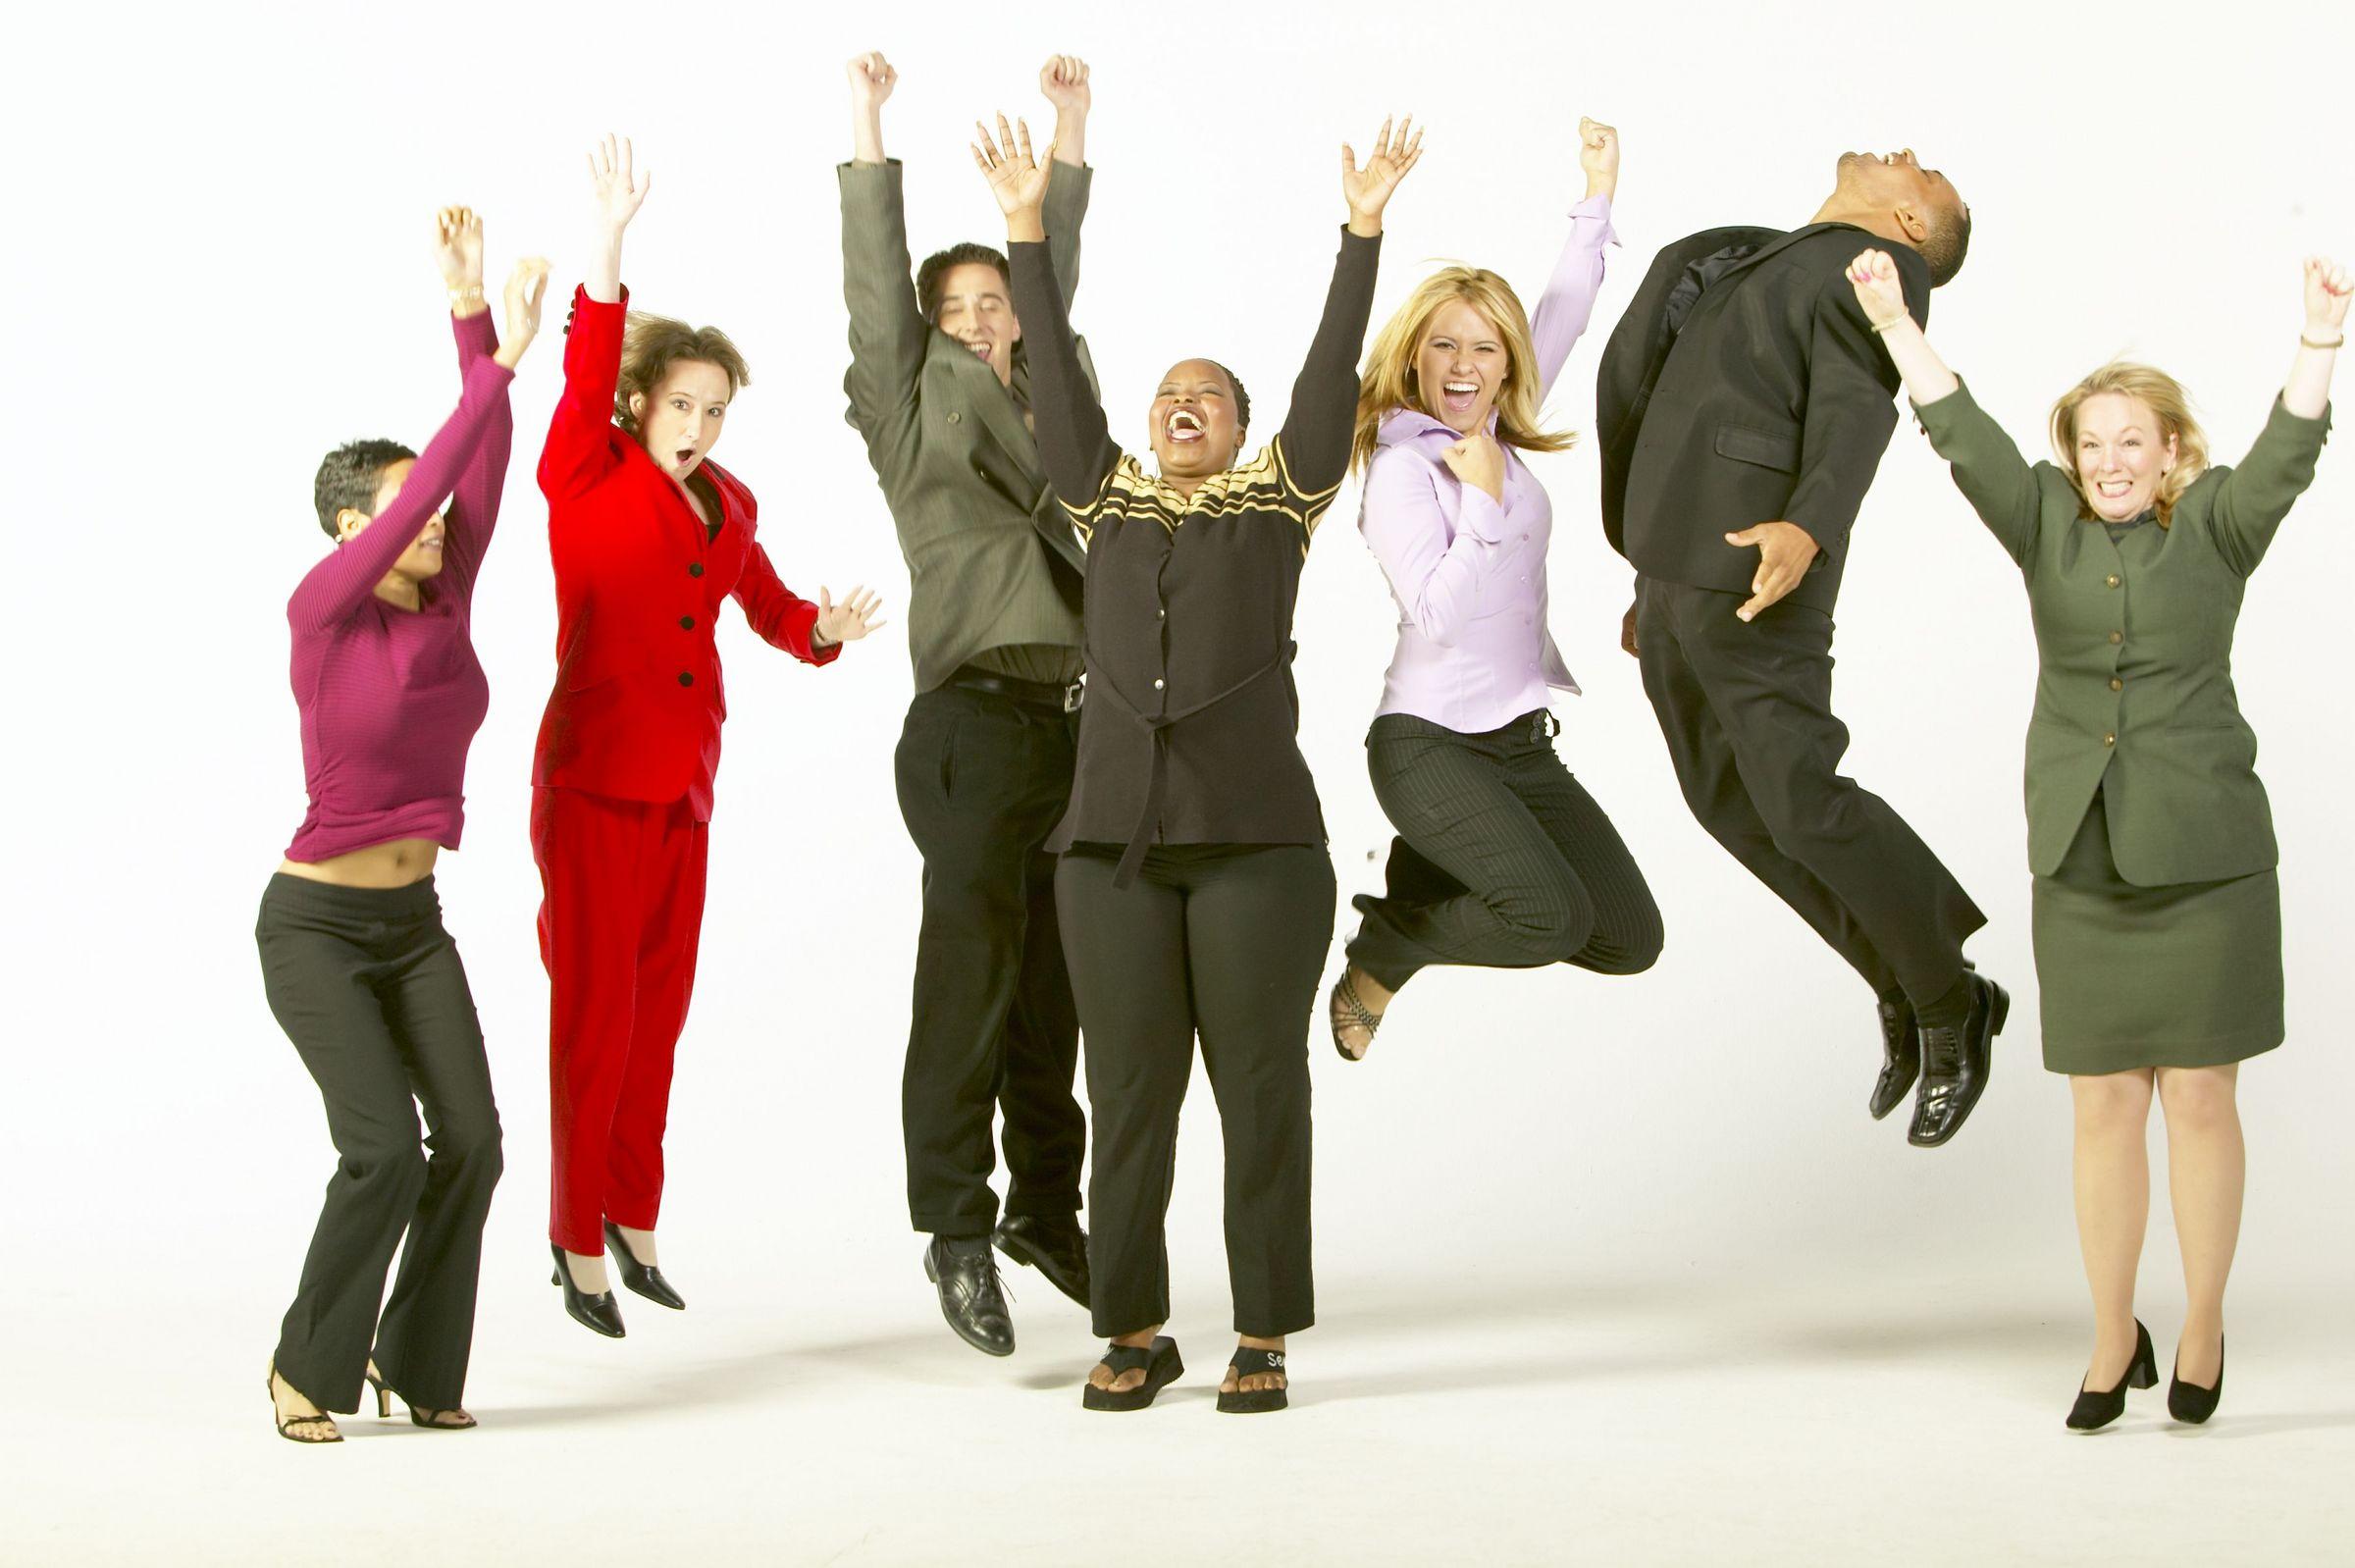 business_gente_salto_felici_vittoria_successo.jpg